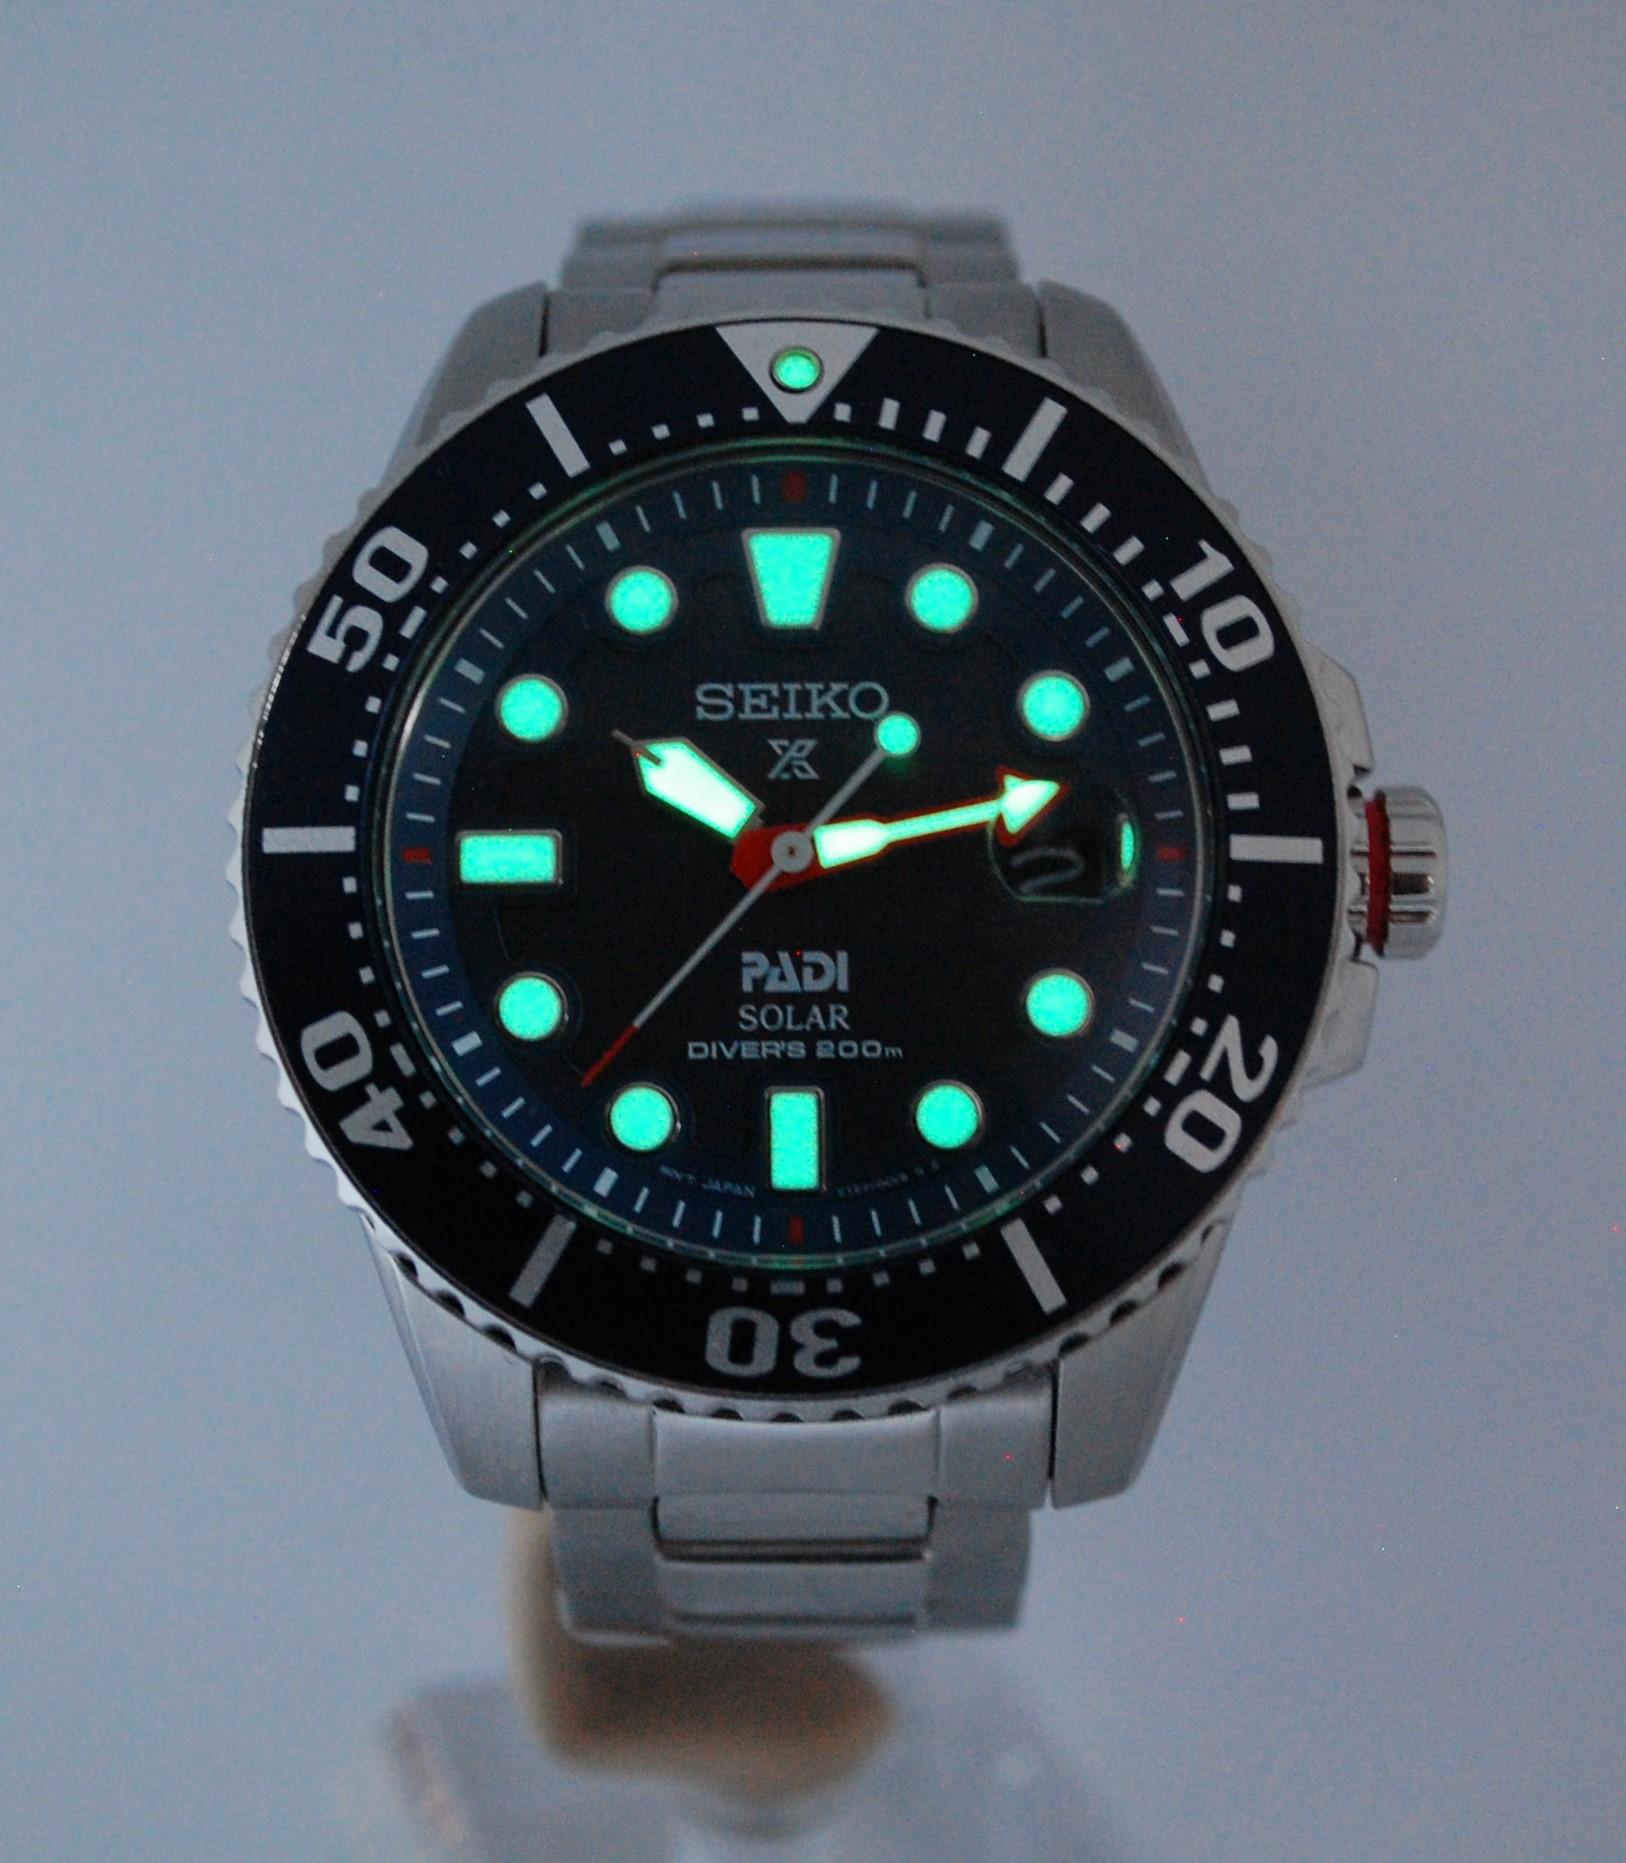 Sold 2017 Seiko Prospex Padi Solar Divers Watch Birth